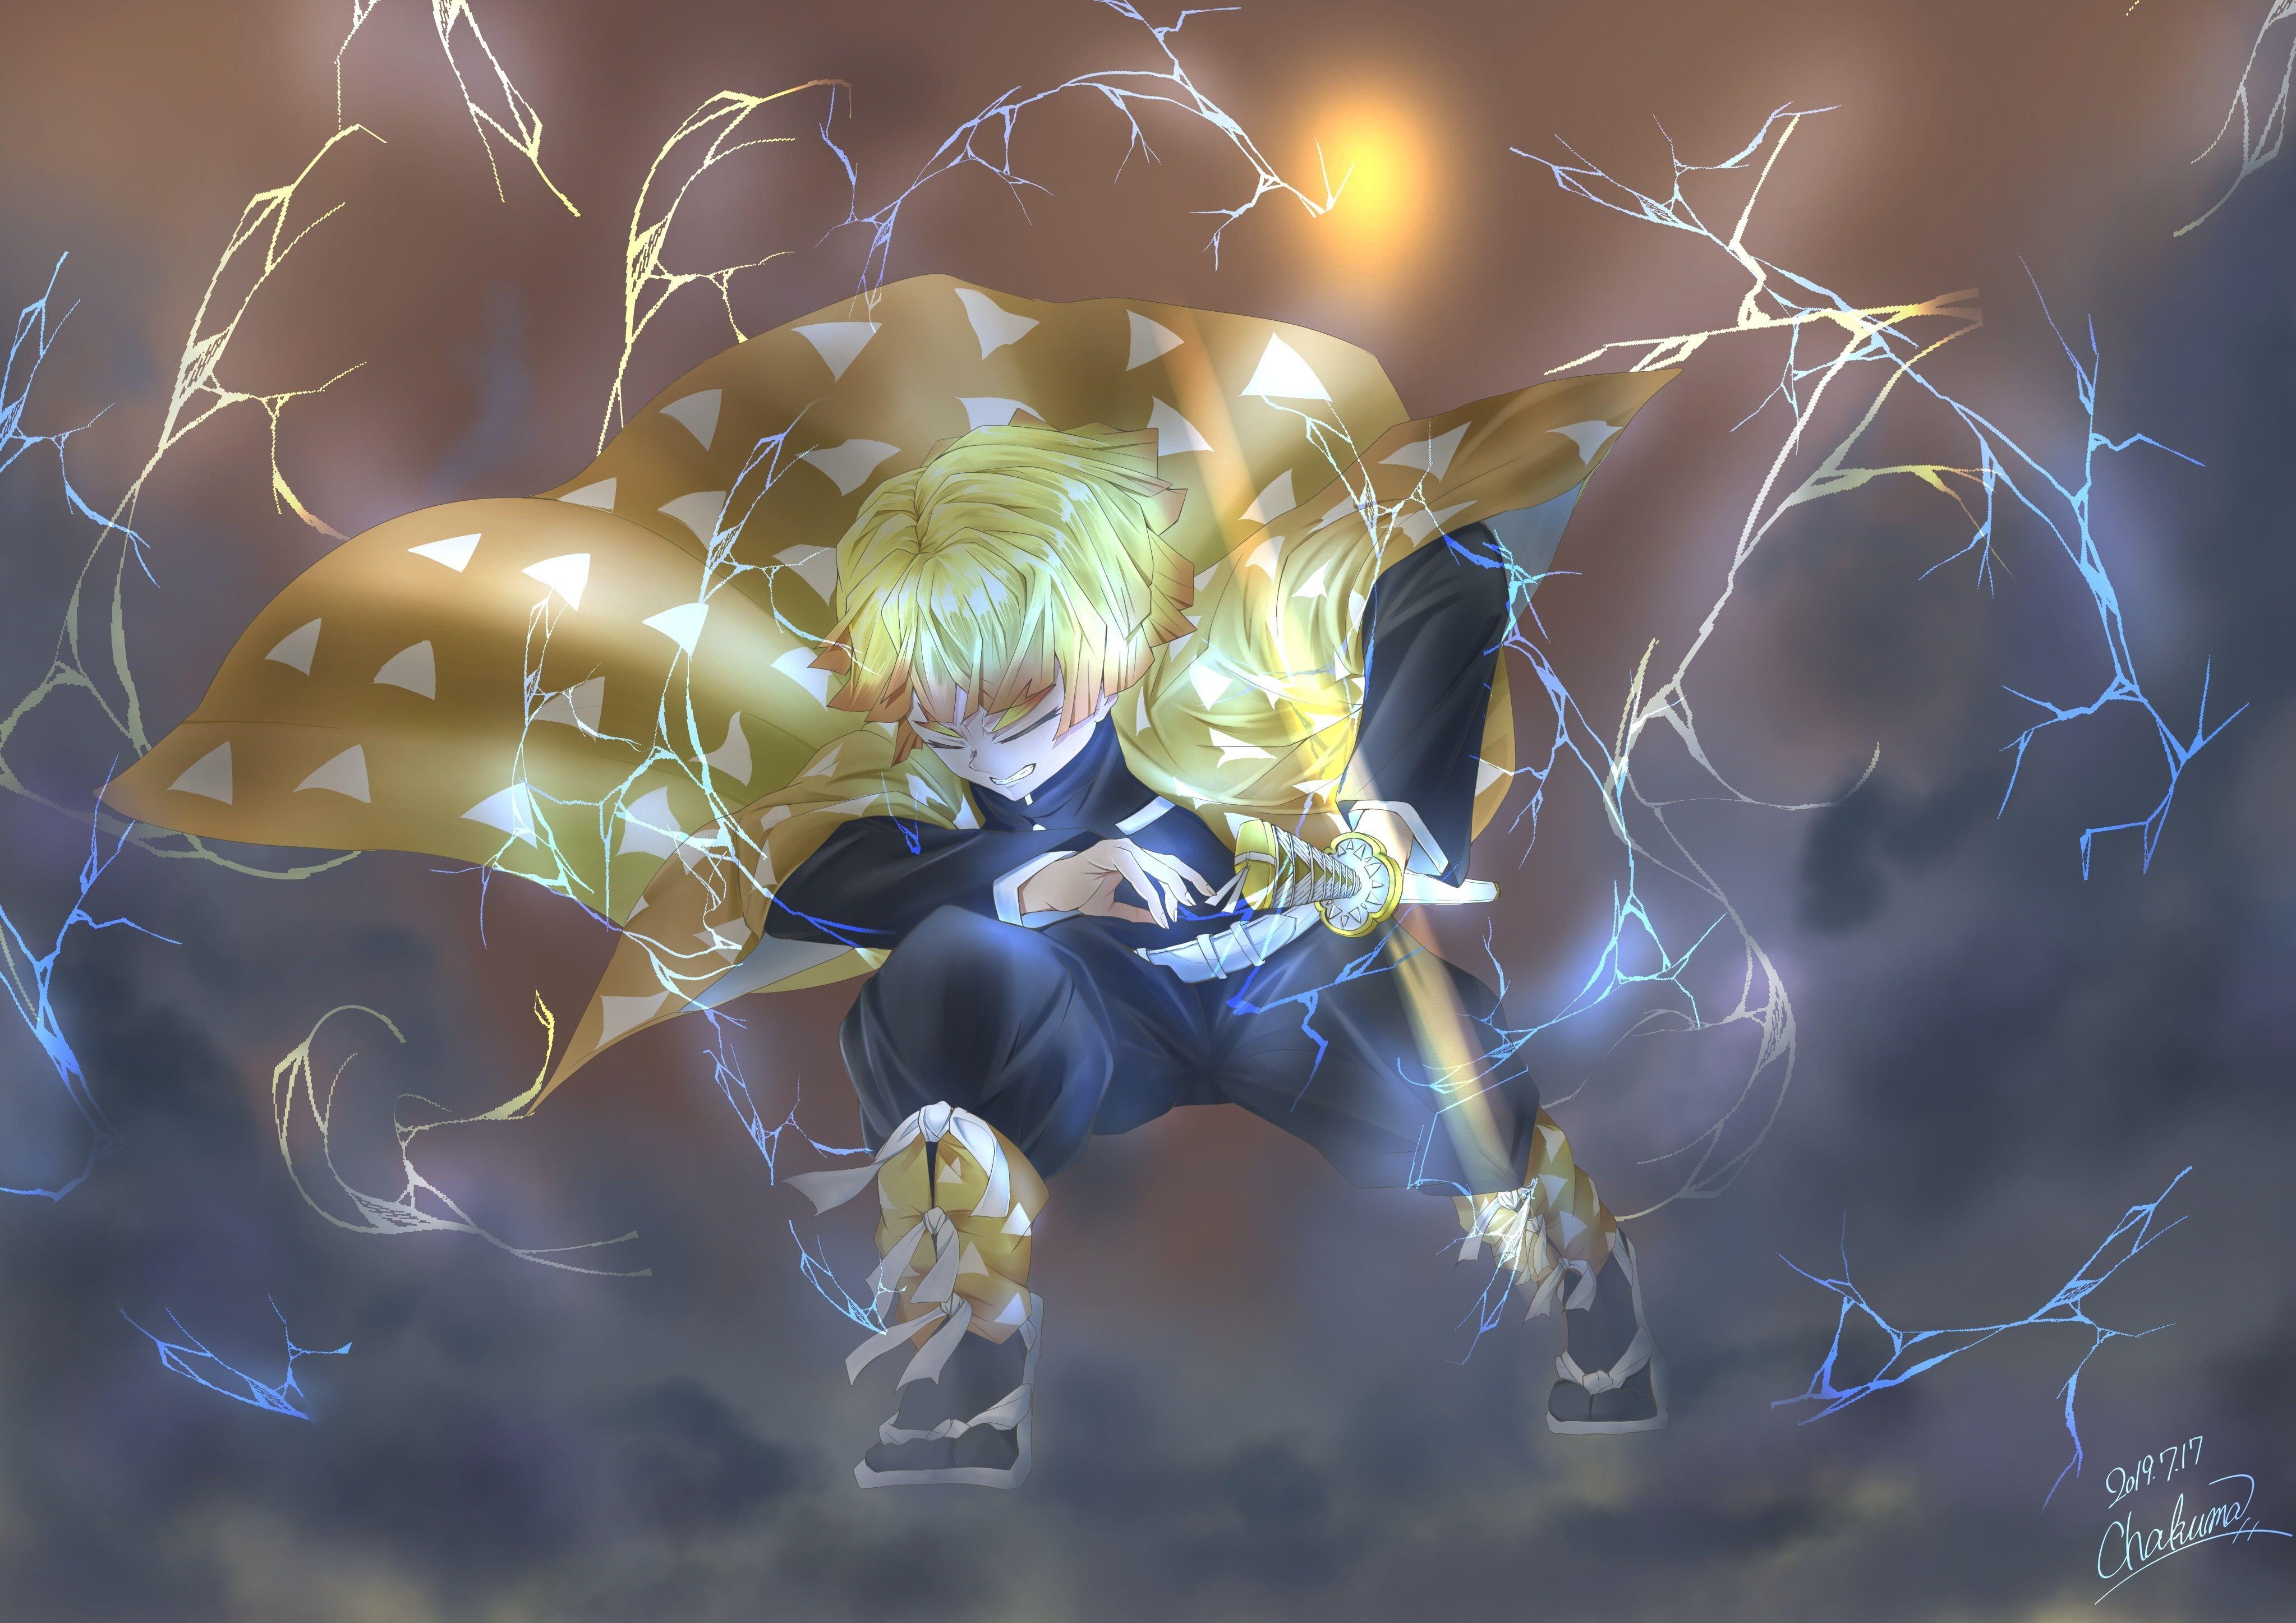 Anime Demon Slayer Kimetsu No Yaiba Zenitsu Agatsuma 4k Wallpaper Hdwallpaper Desktop Hd Anime Wallpapers Cool Anime Wallpapers Anime Wallpaper 1920x1080